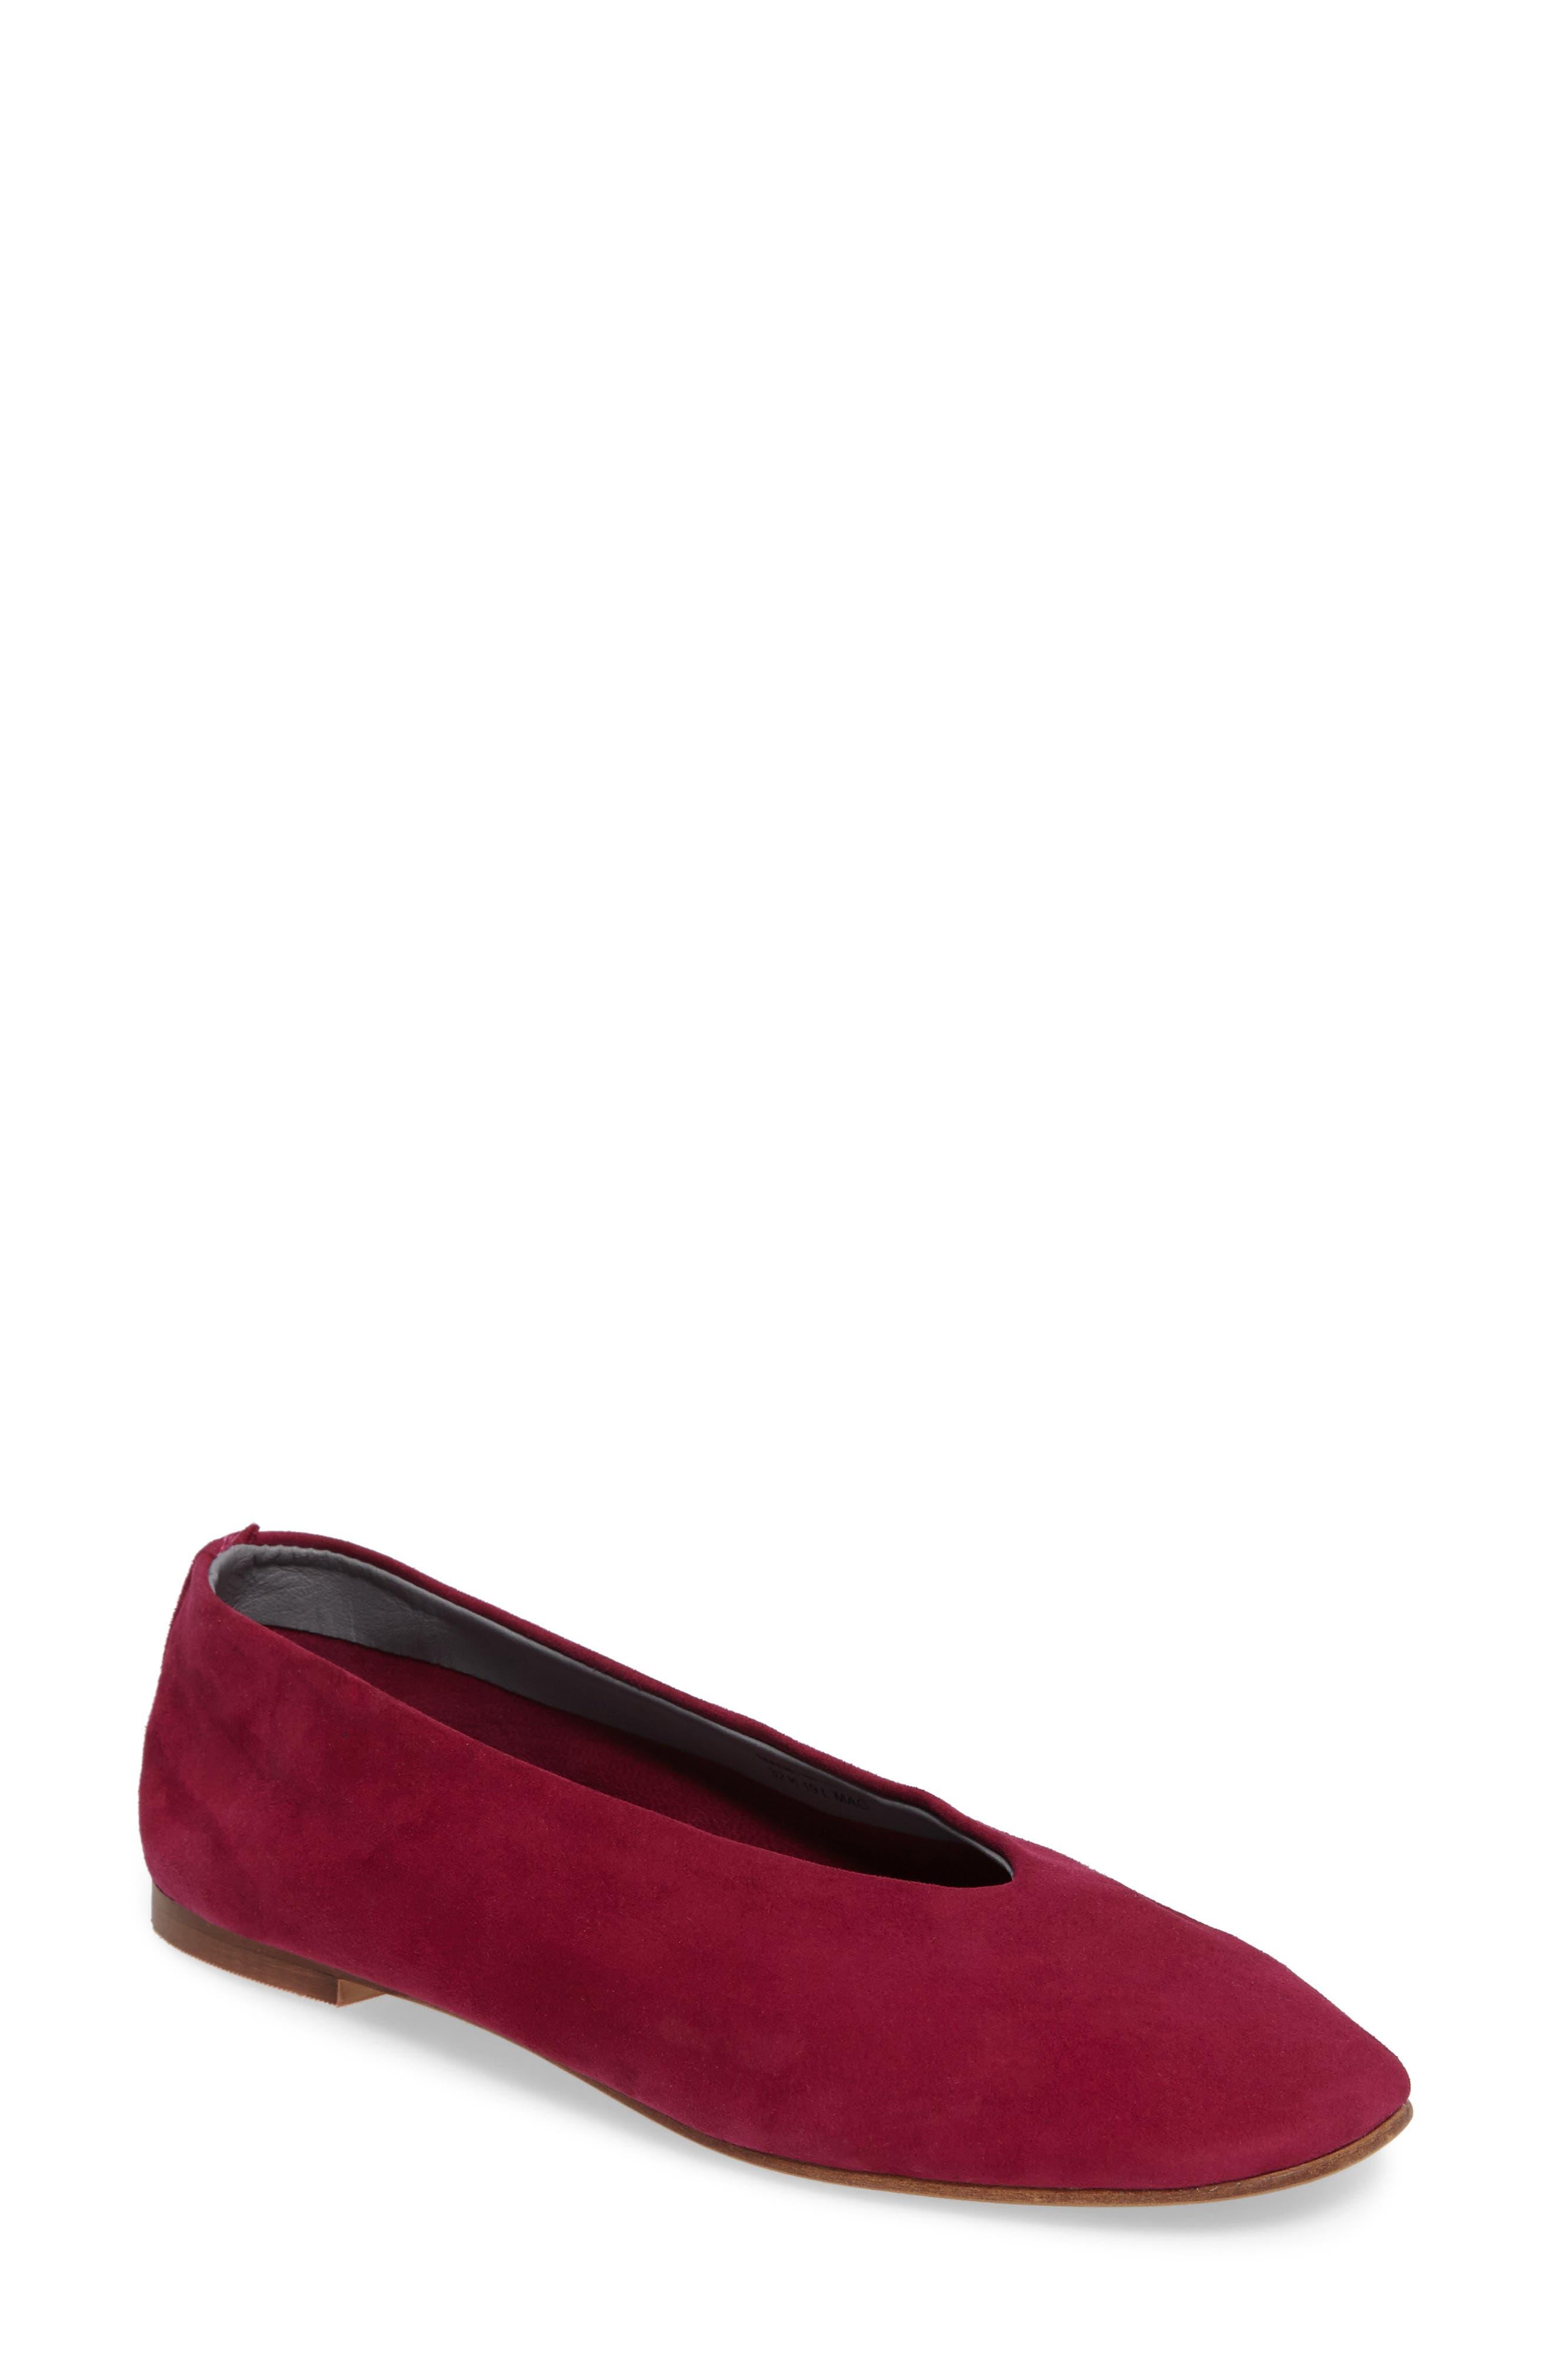 Kick Ballet Flat,                         Main,                         color, 650